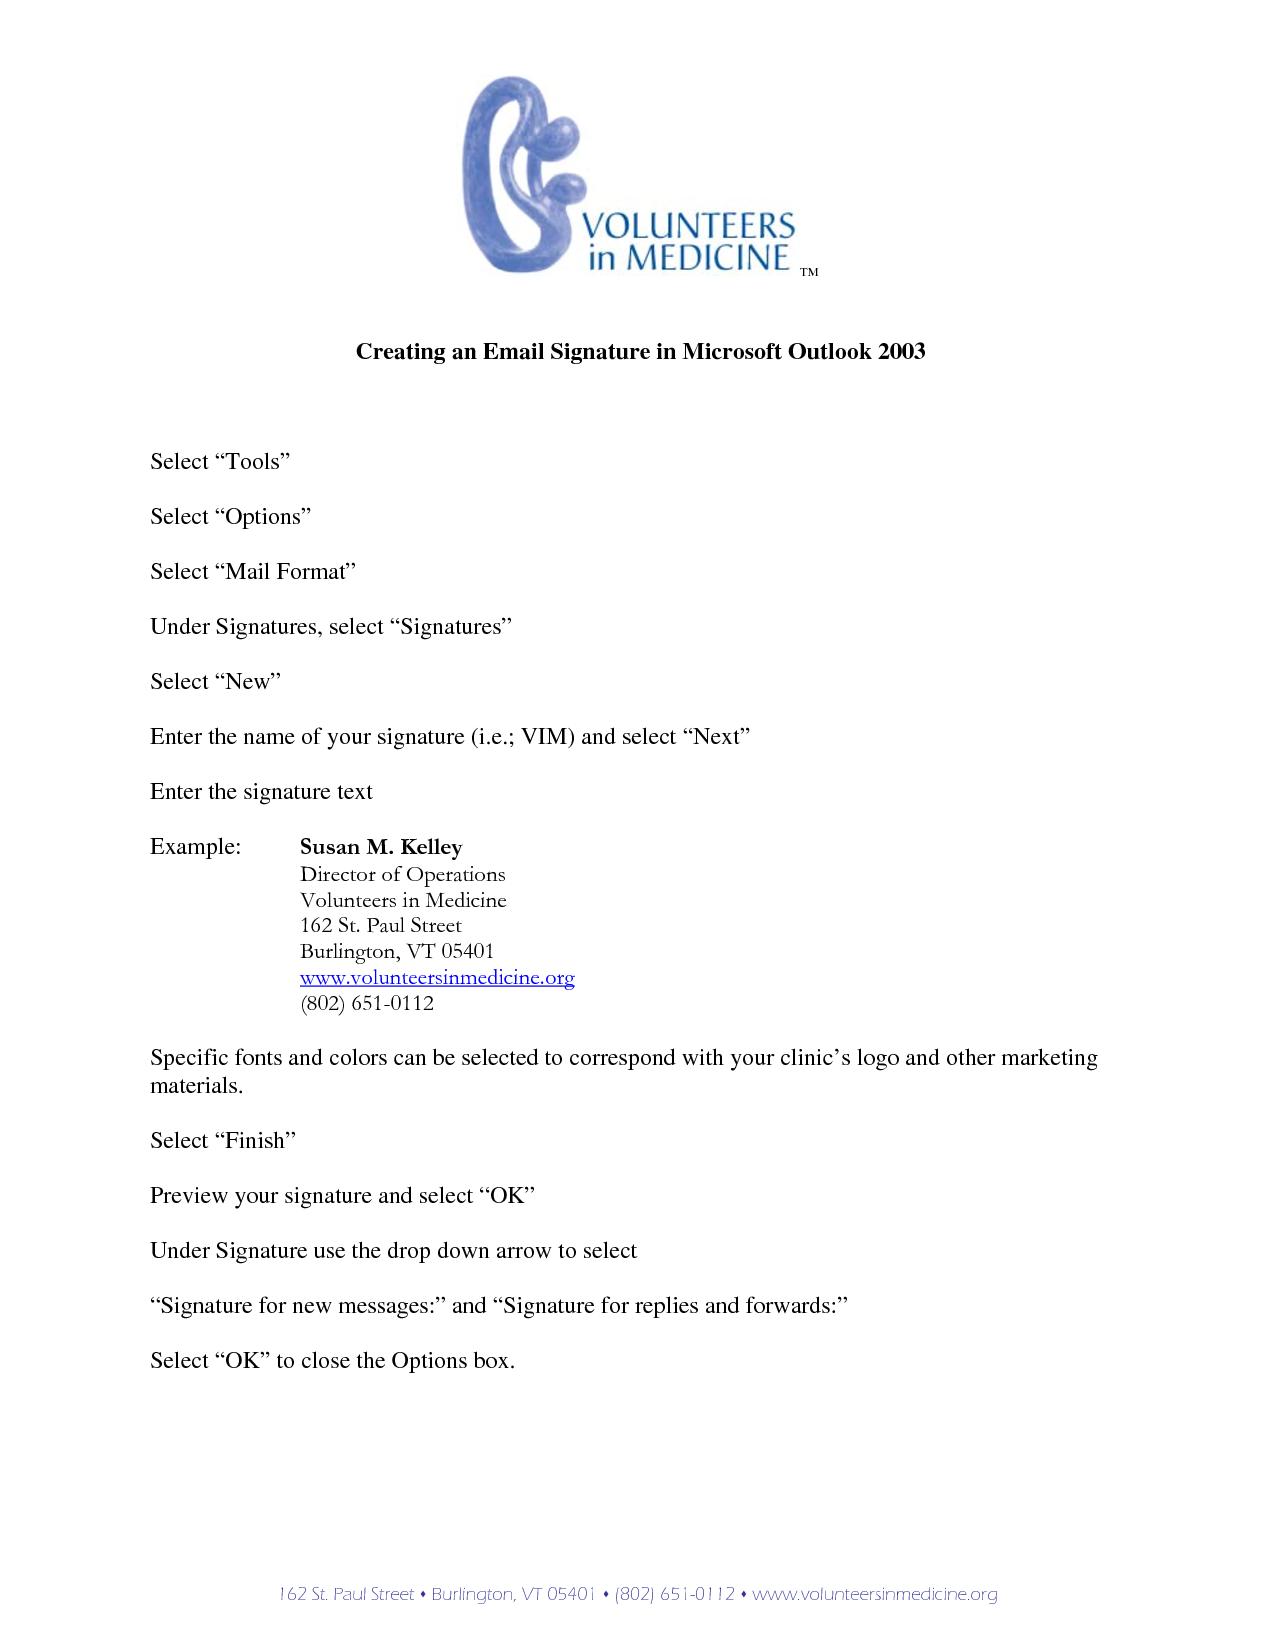 Microsoft Outlook Email Signature Take our FREE Mini